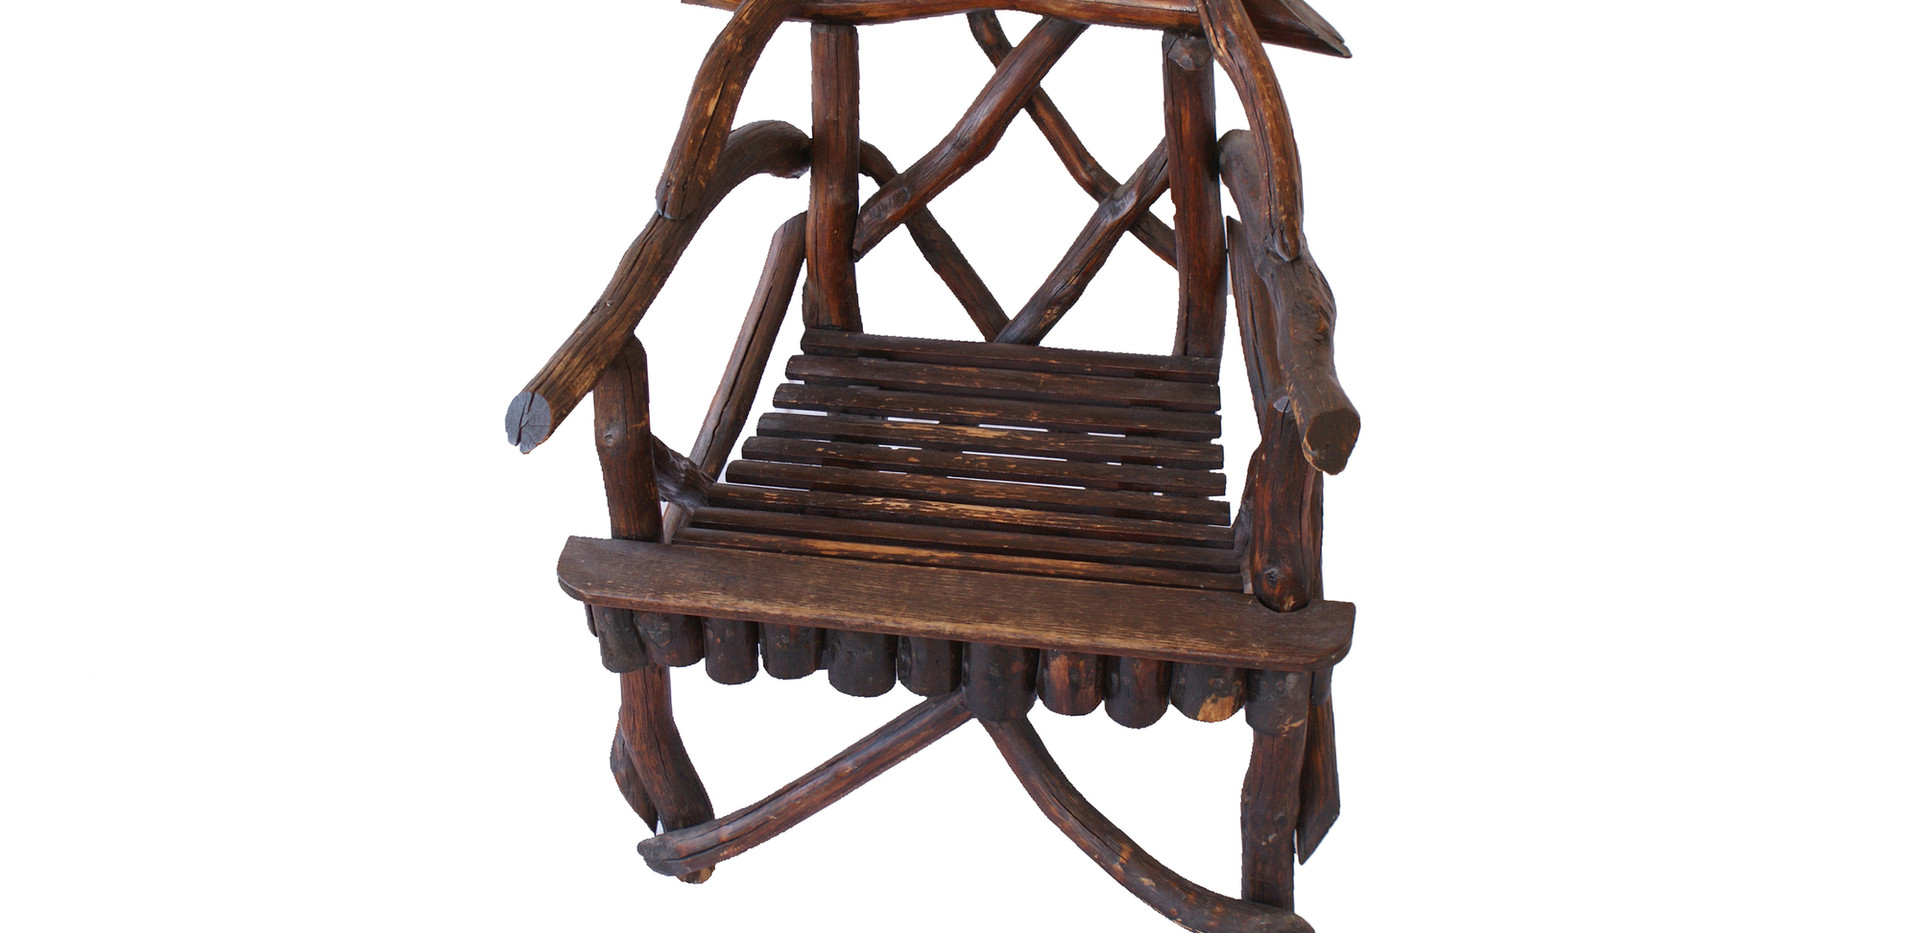 Early 20th Century American Folk Art Twig/Root Rustic Arm Chair